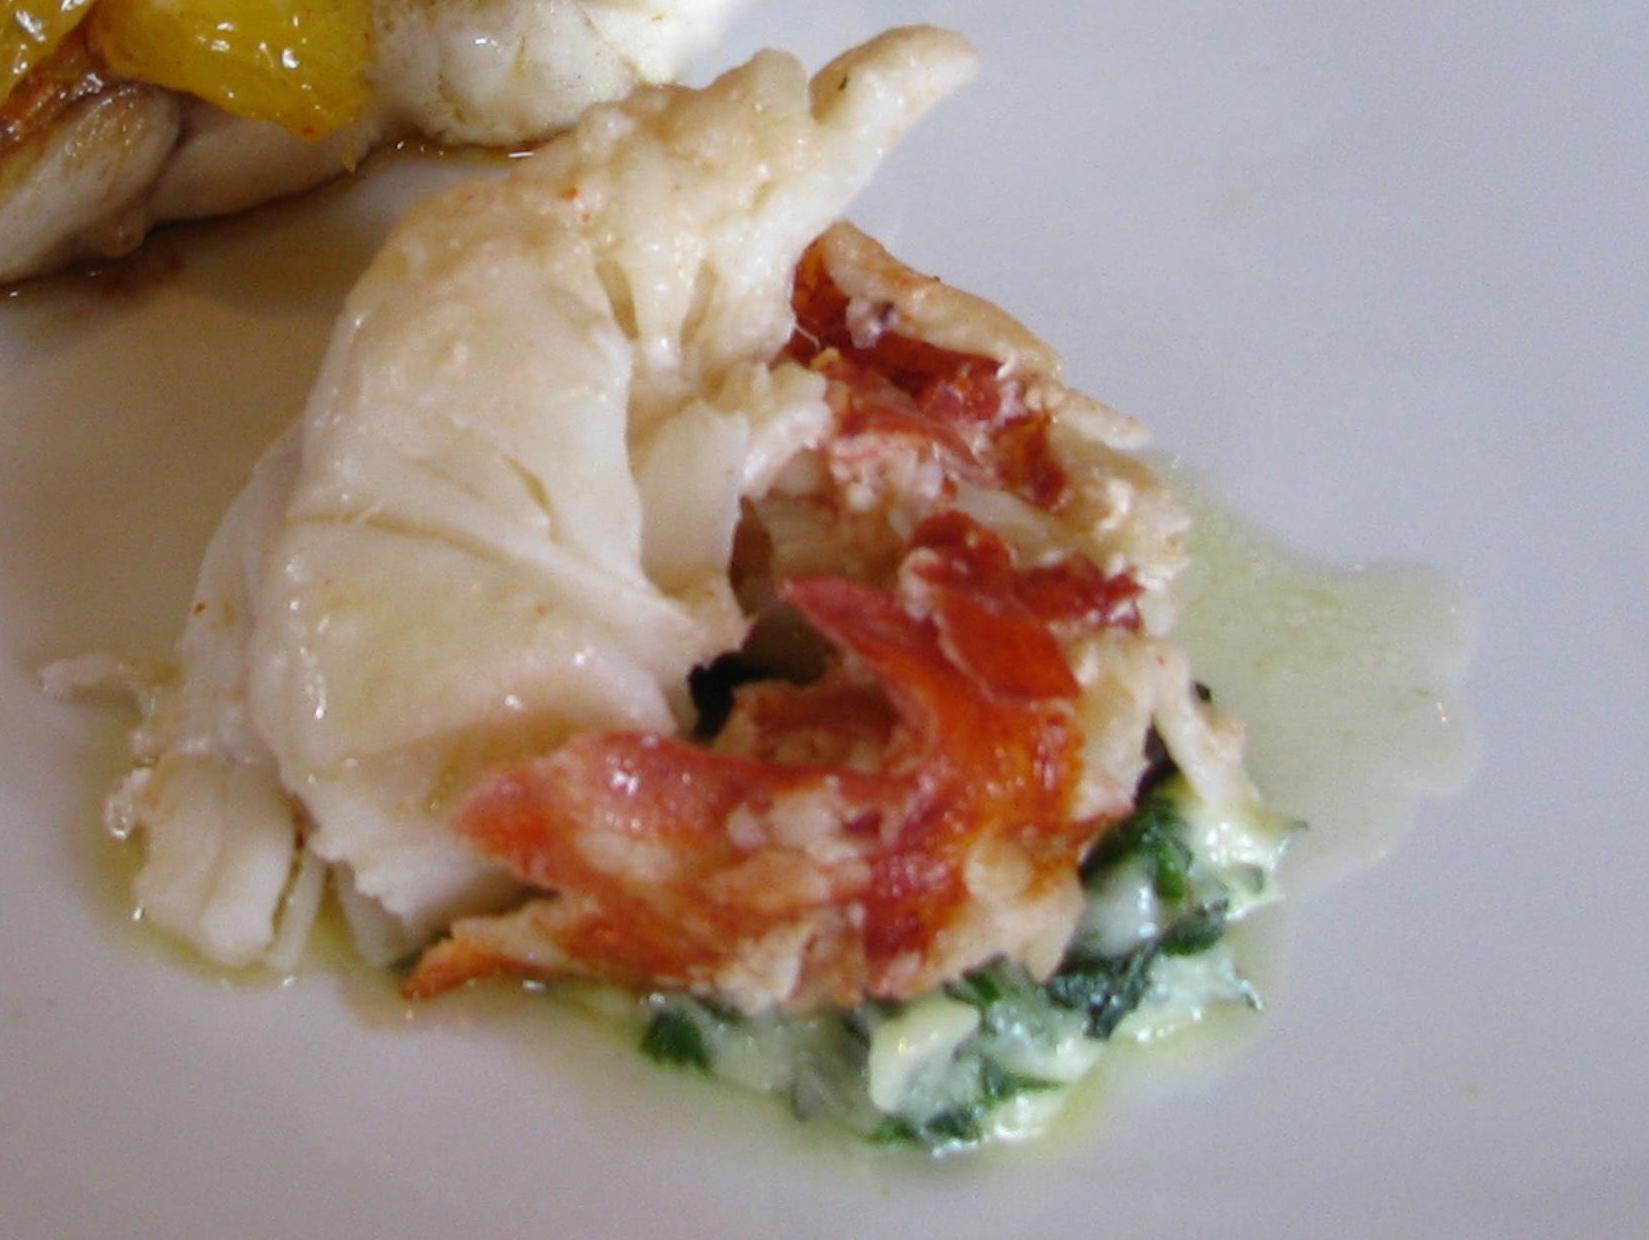 Lobster with Lemon-herbed butter